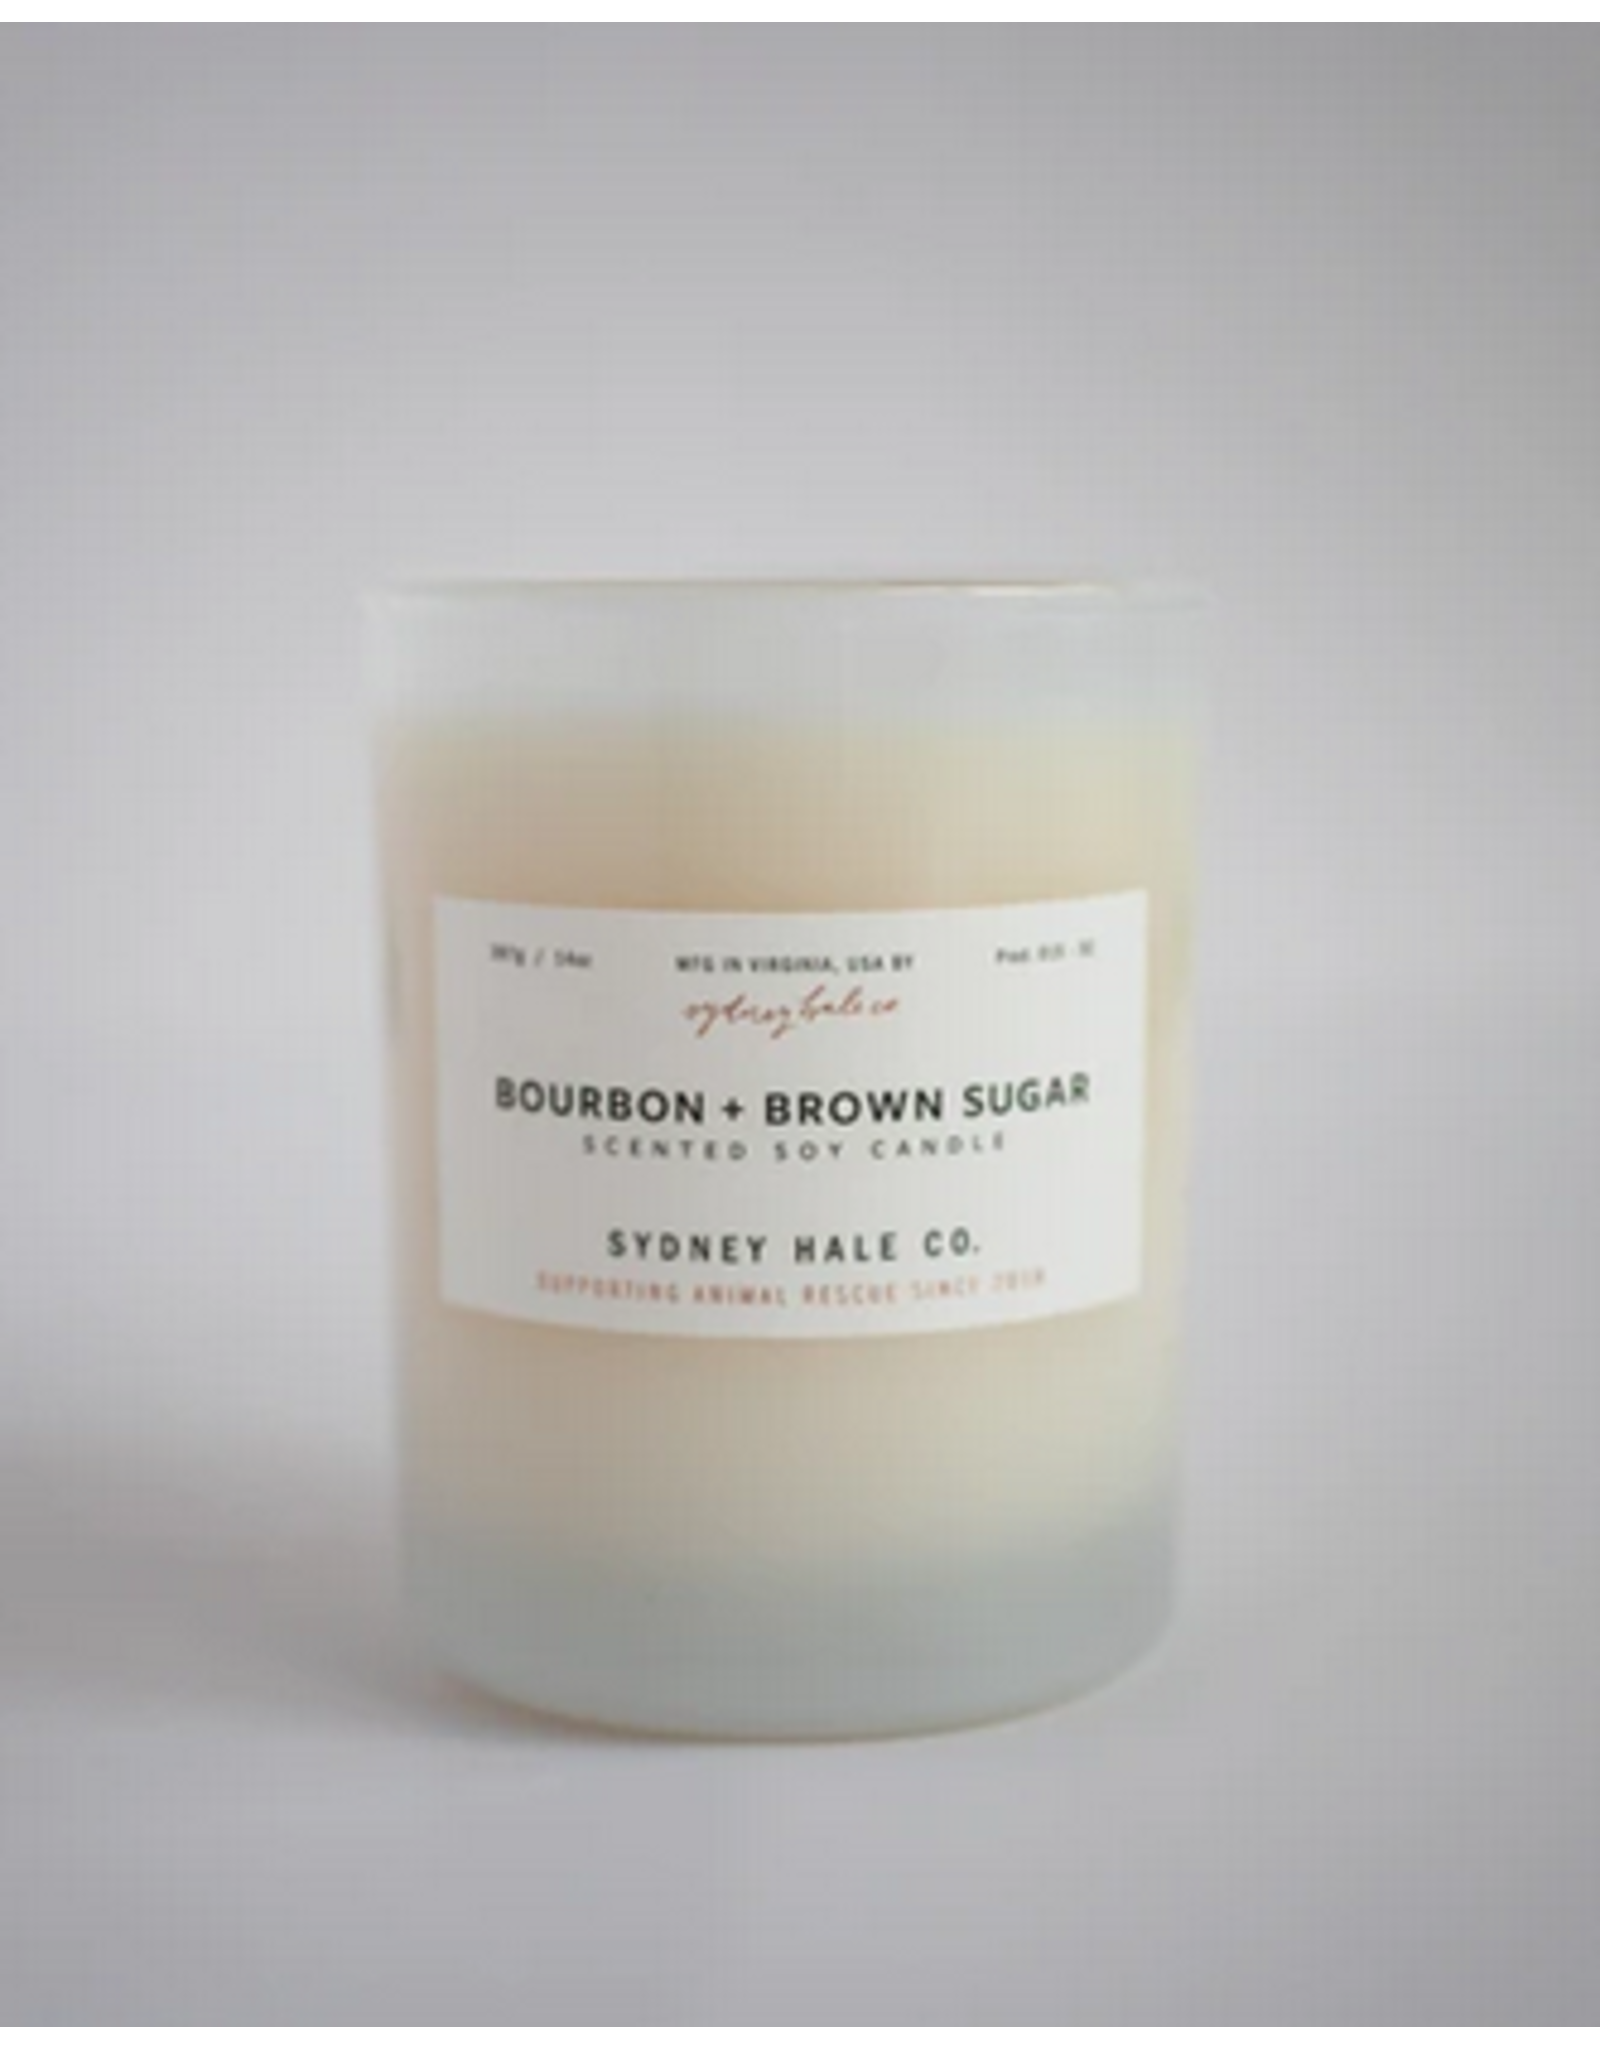 Sydney Hale Co. Clear Glass - Bourbon & Brown Sugar